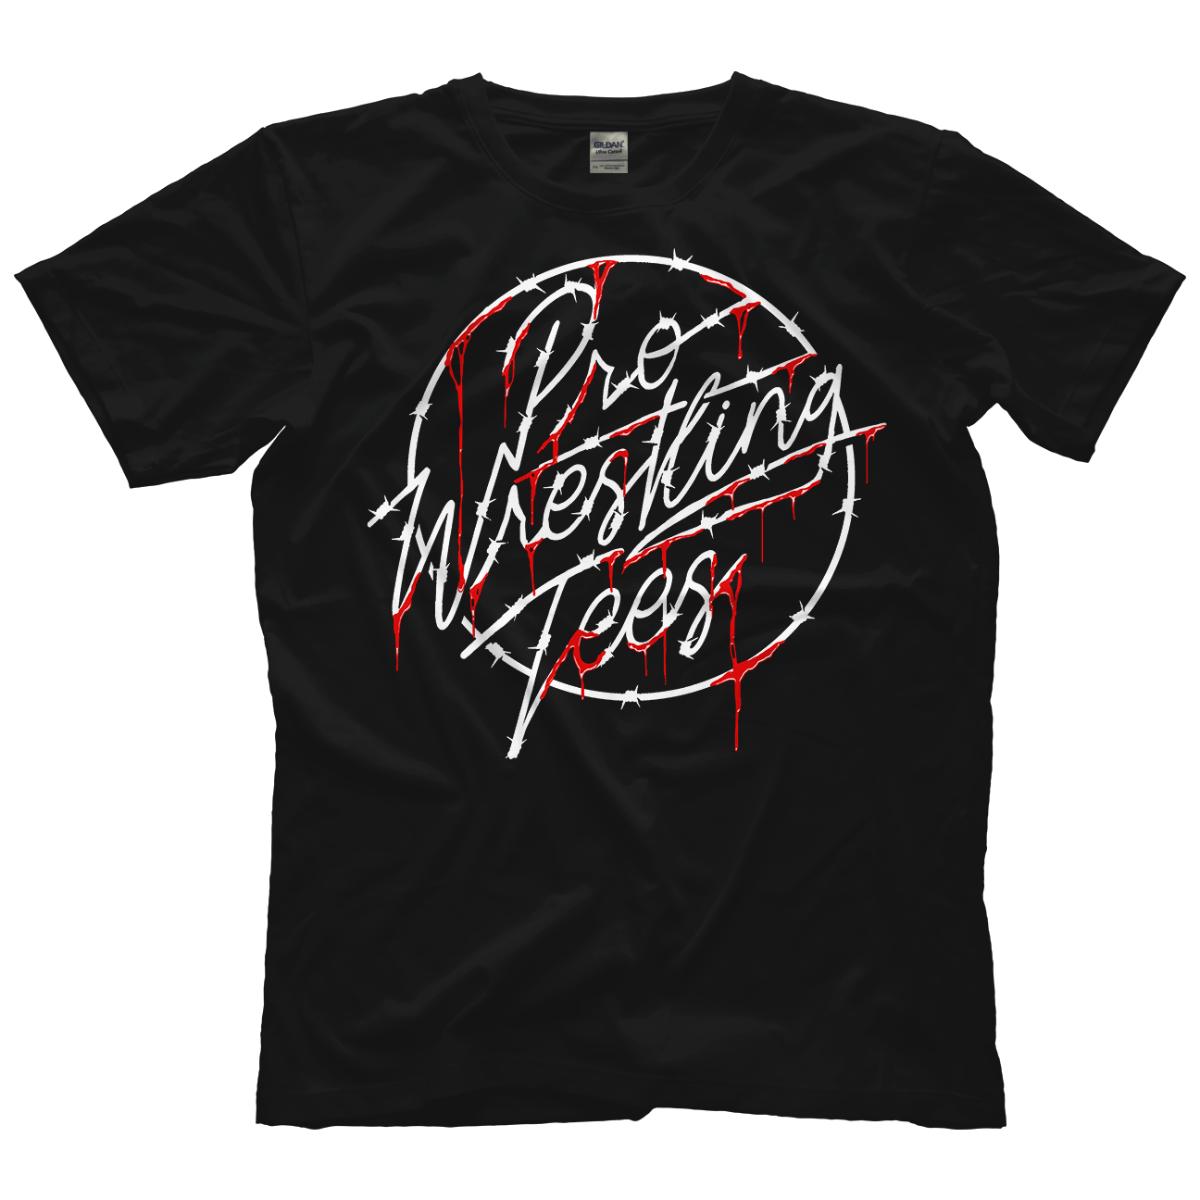 Pro Wrestling Tees Skewed Flag Logo T-shirt